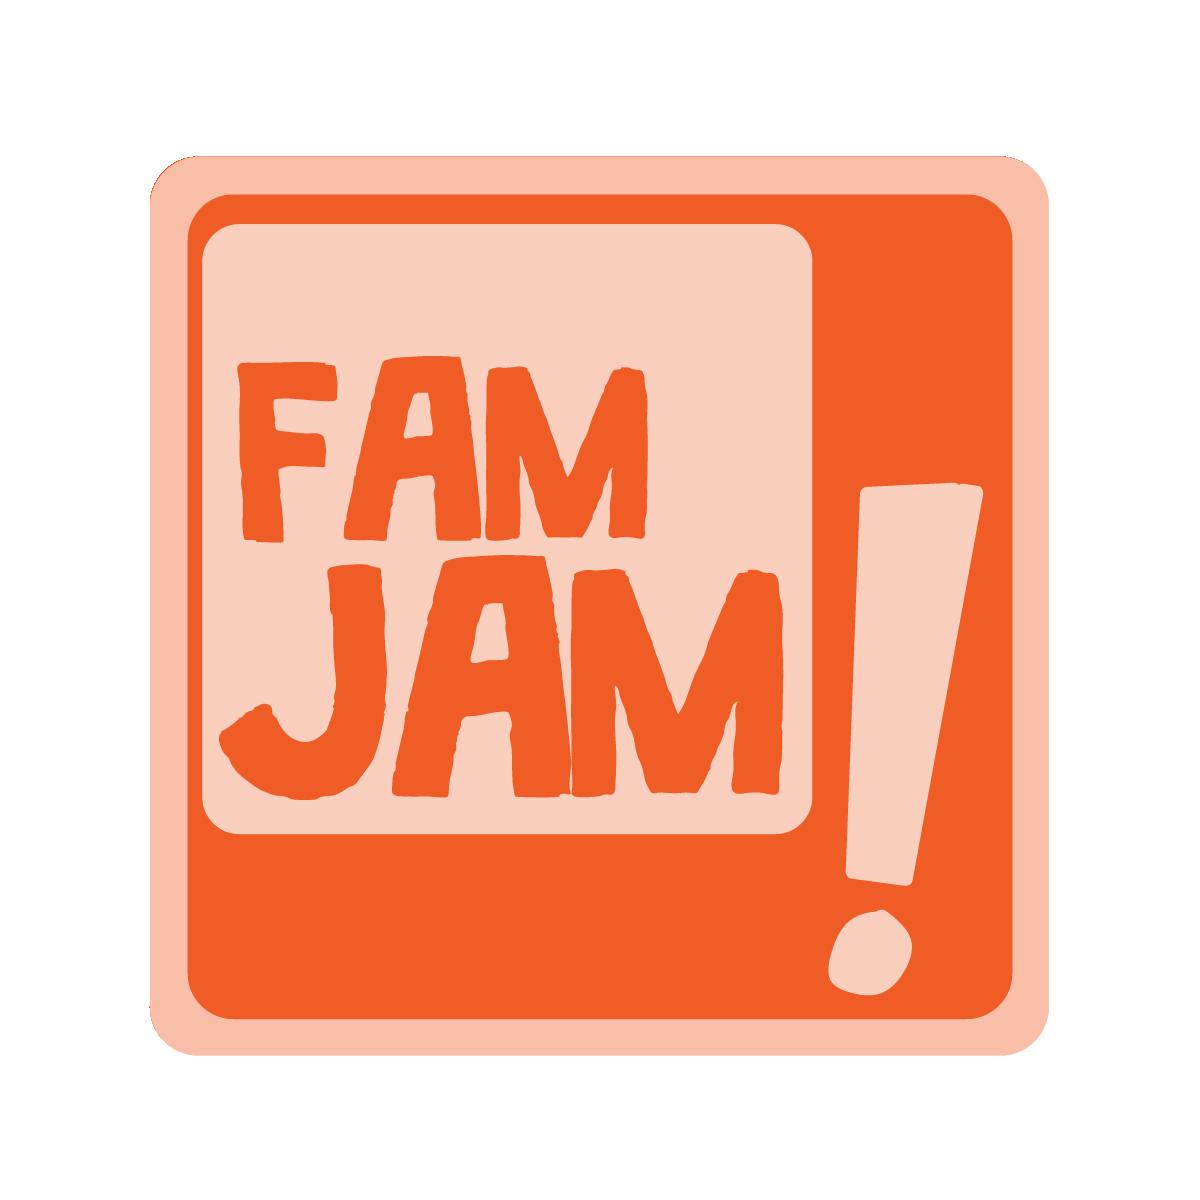 Fam Jam